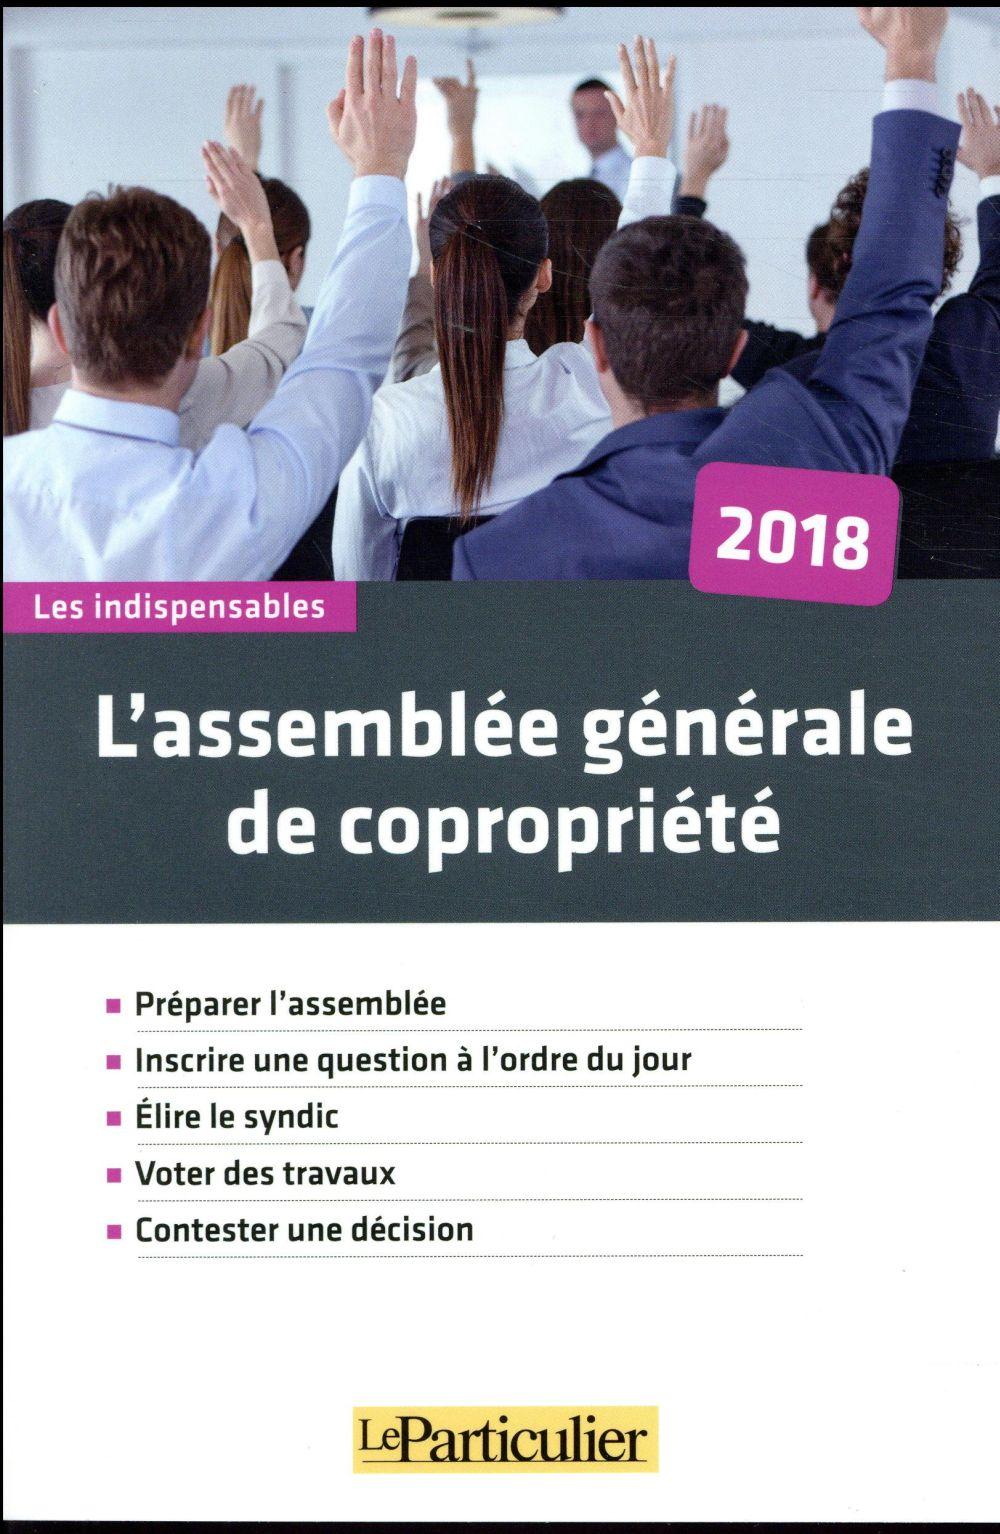 L ASSEMBLEE GENERALE DE COPROPRIETE 2018